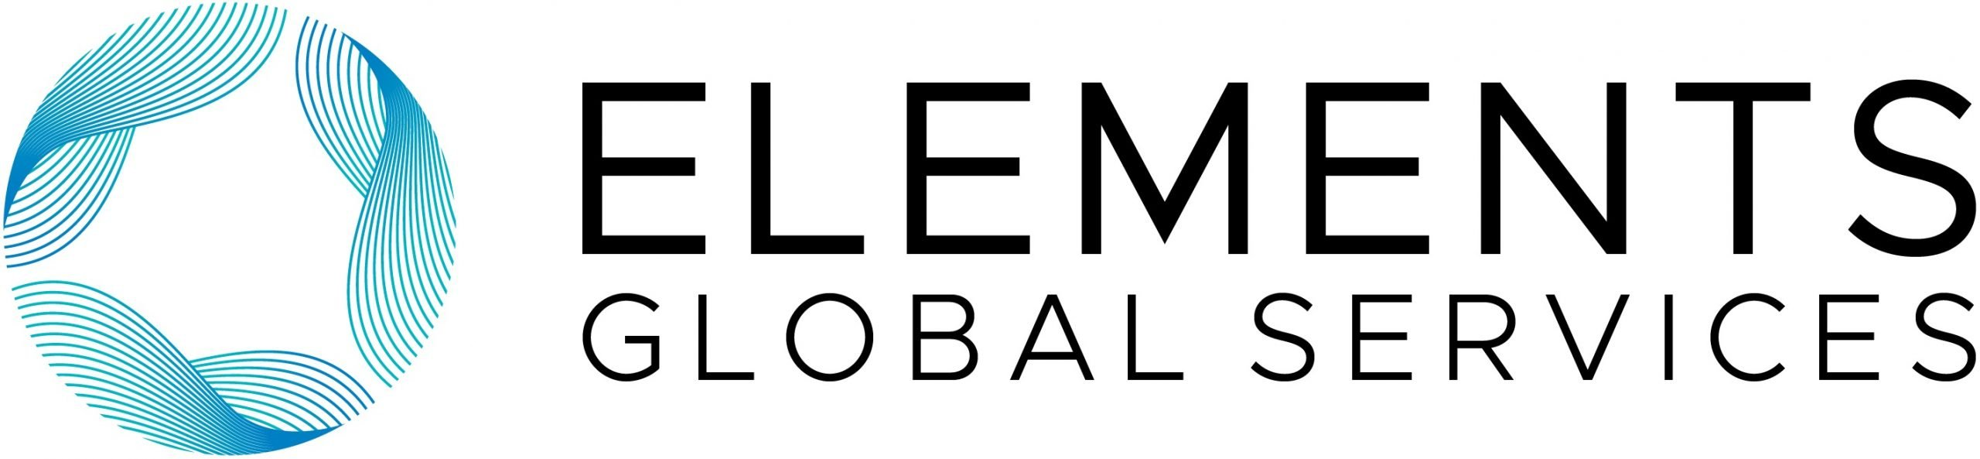 Elements Global Services Logo